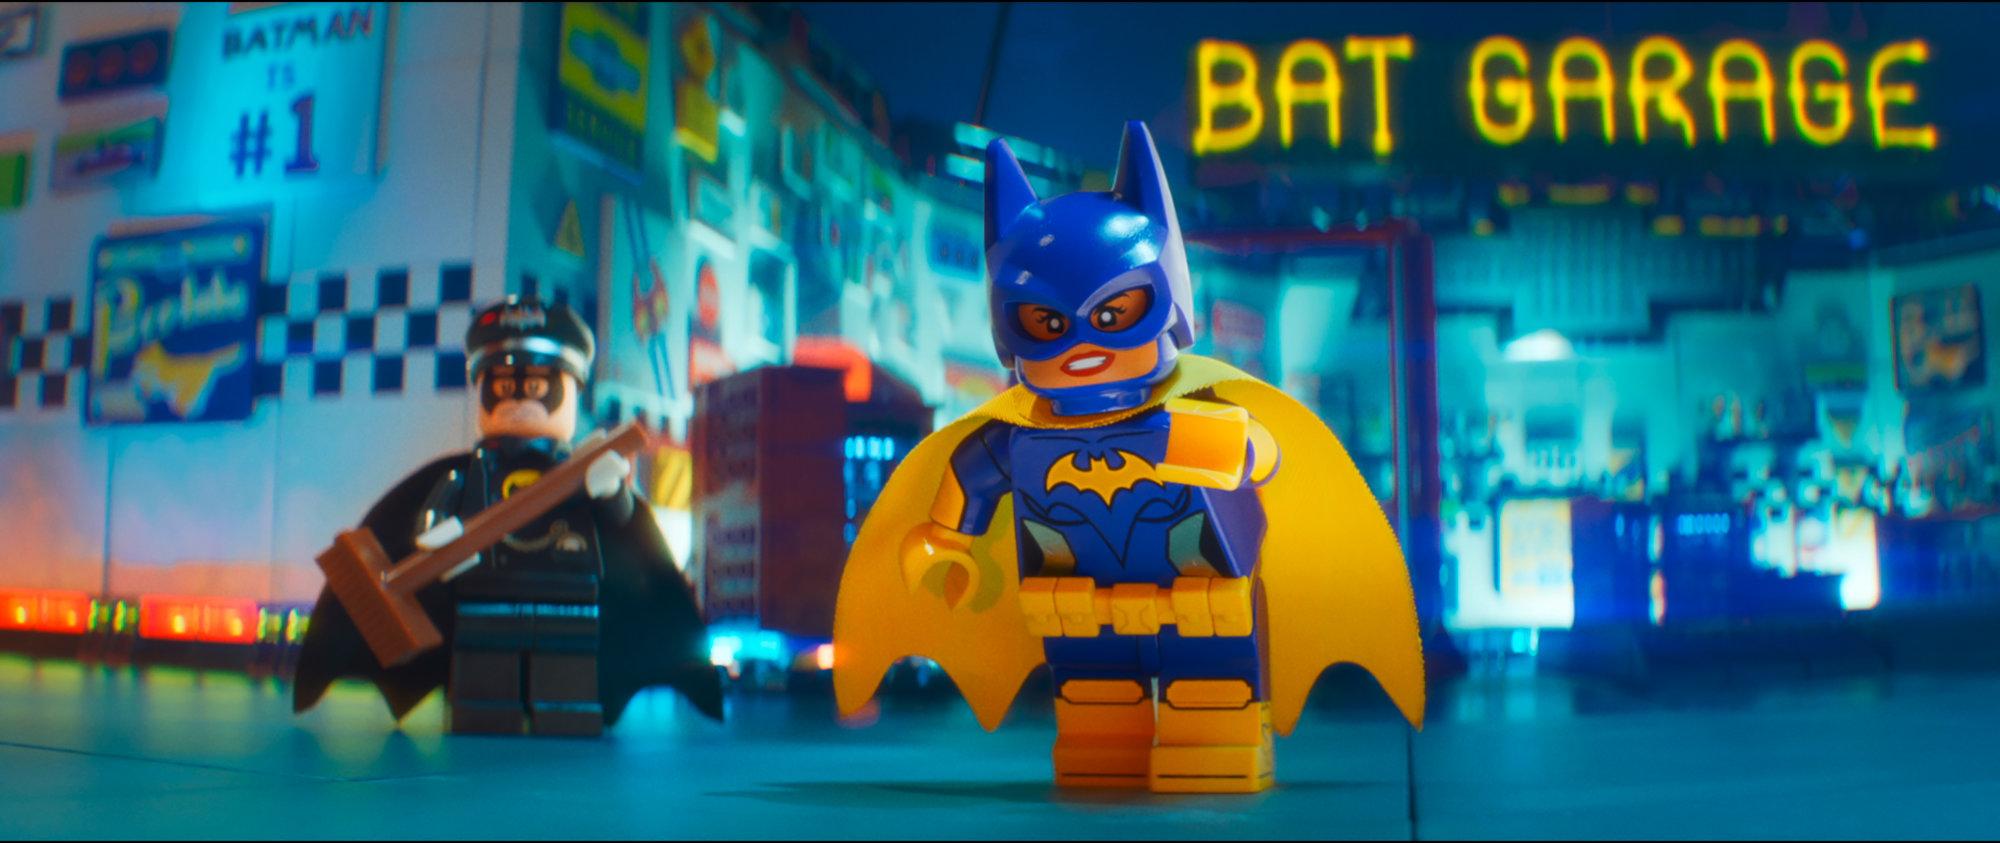 Batgirl in Alfred v Lego batman filmu